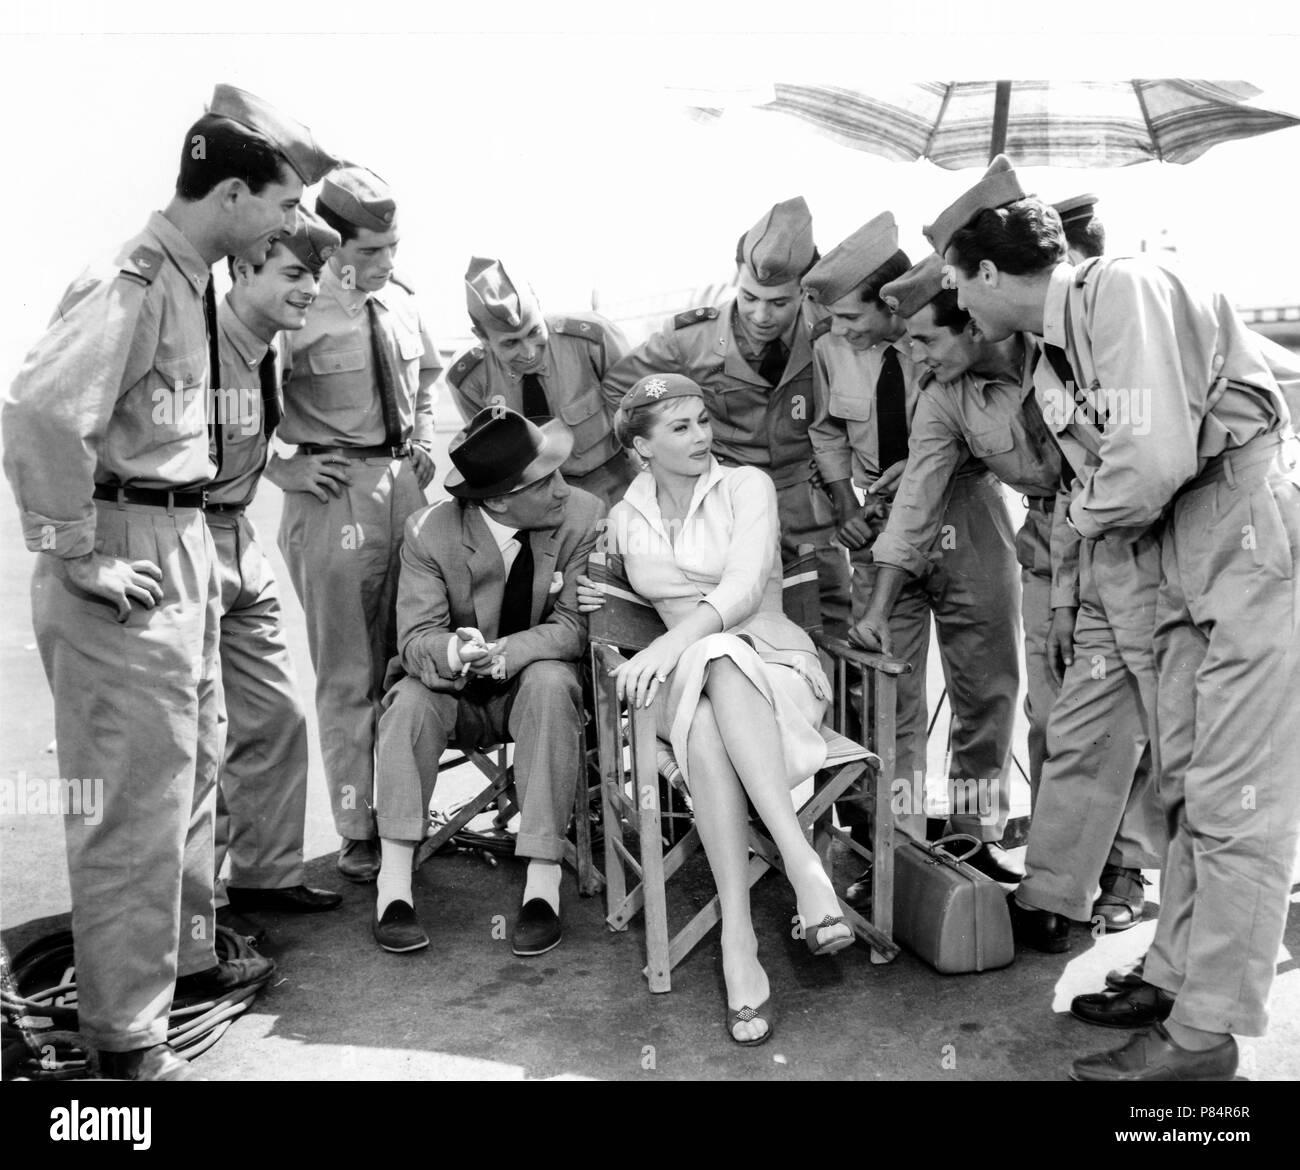 anita ekberg, trevor howard, setof the movie interpol, 1956 - Stock Image